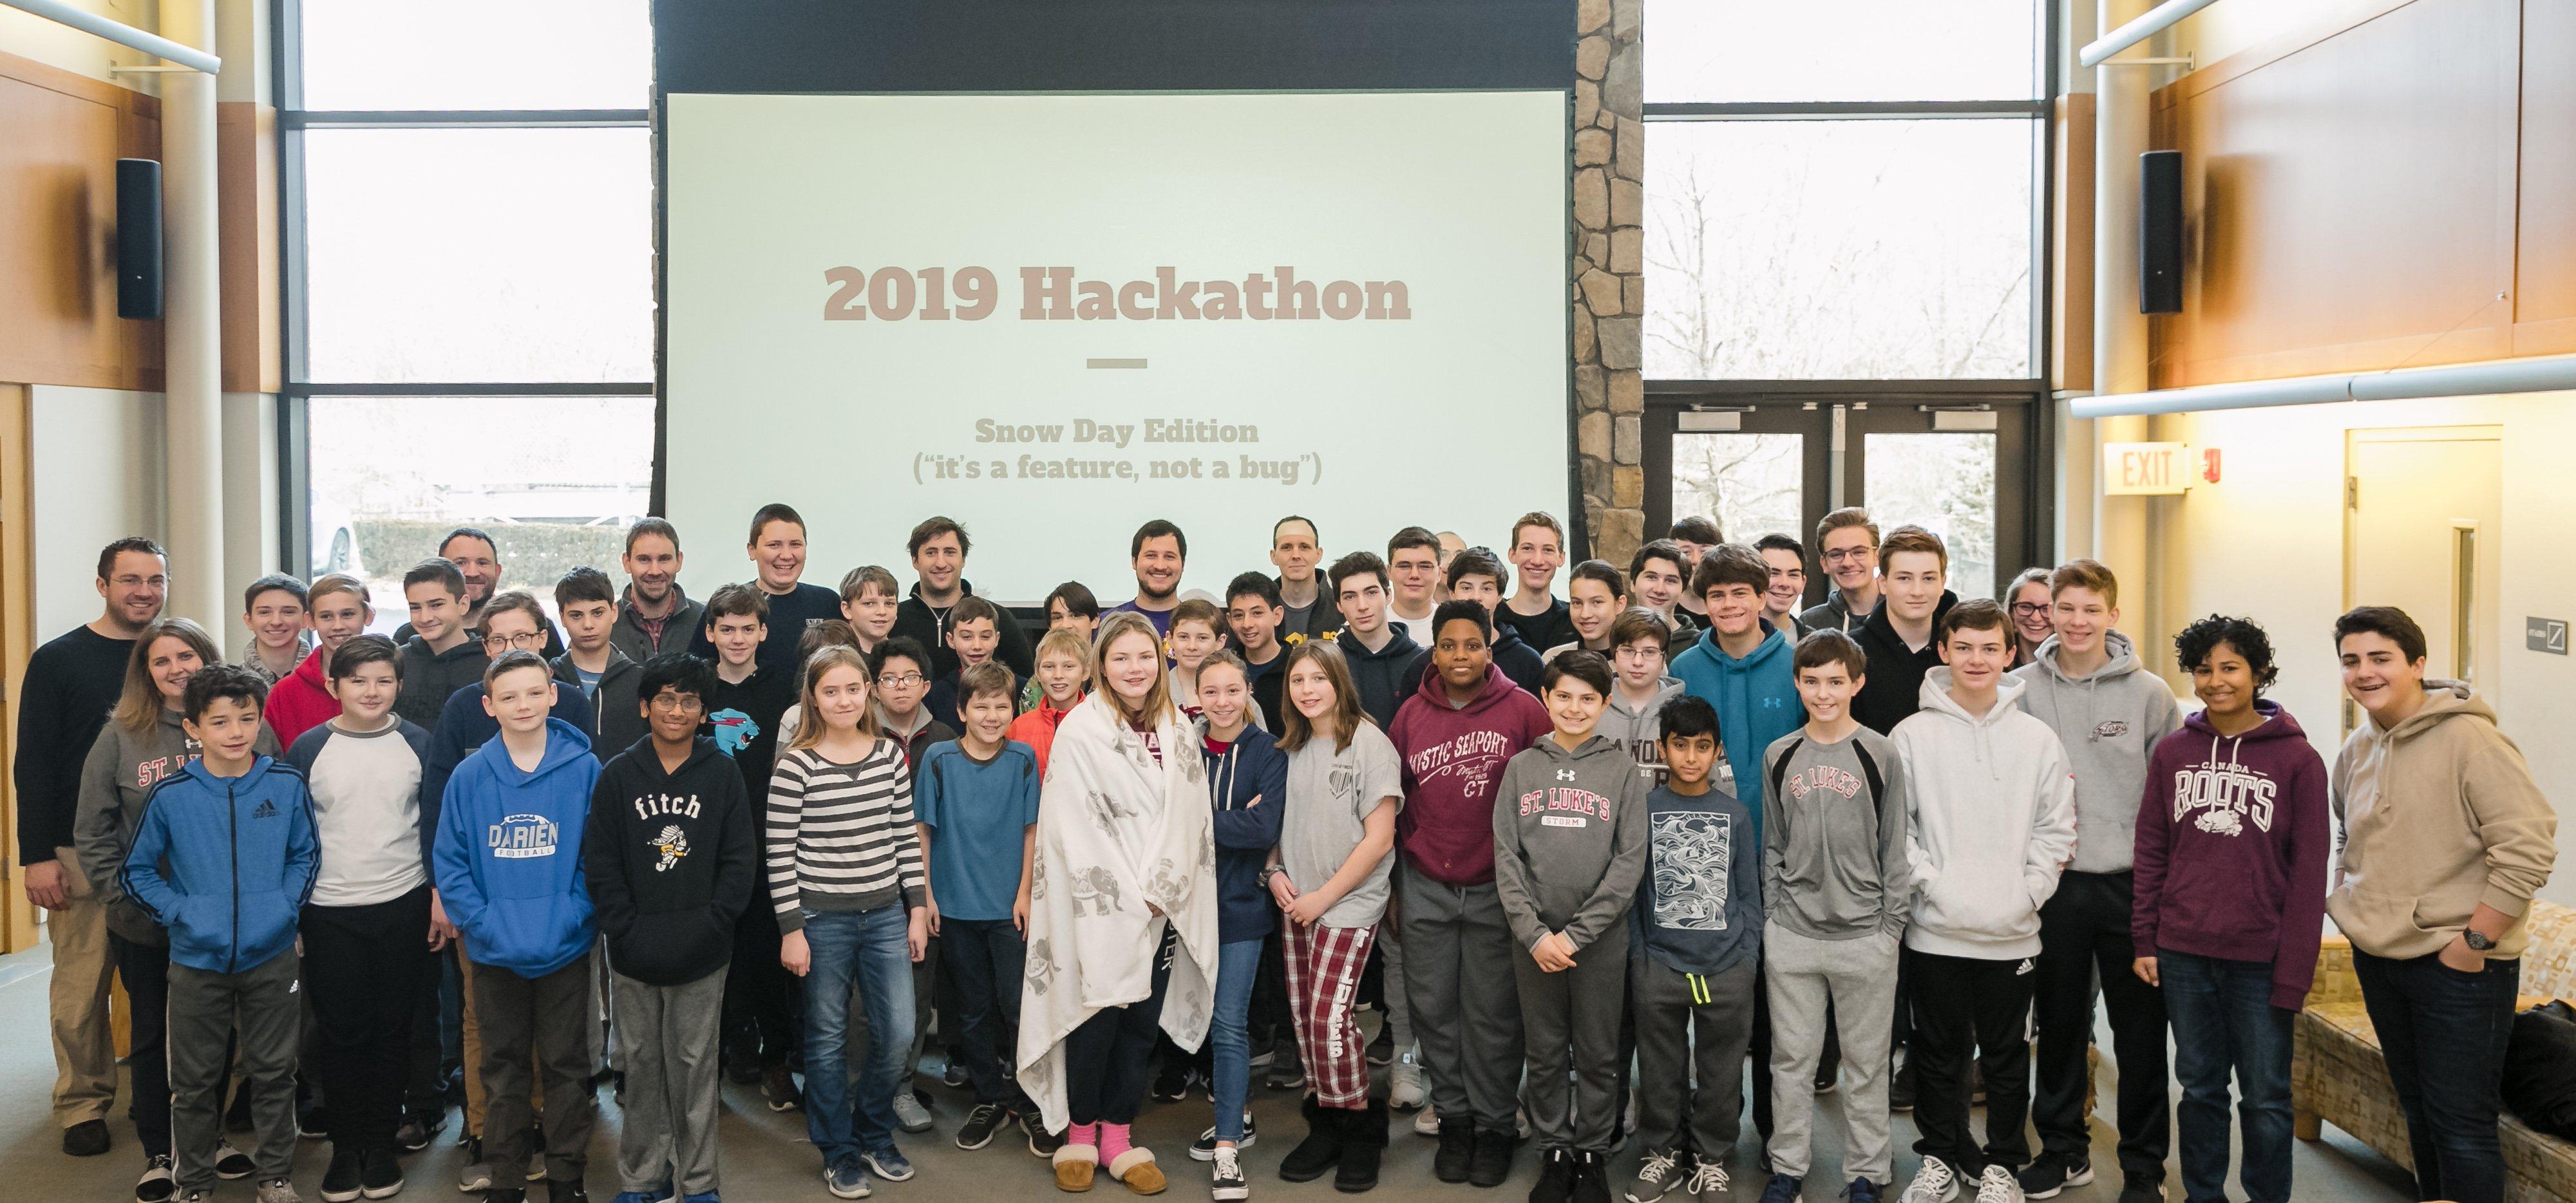 St.-Lukes-2019-Hack-A-Thon-13-2